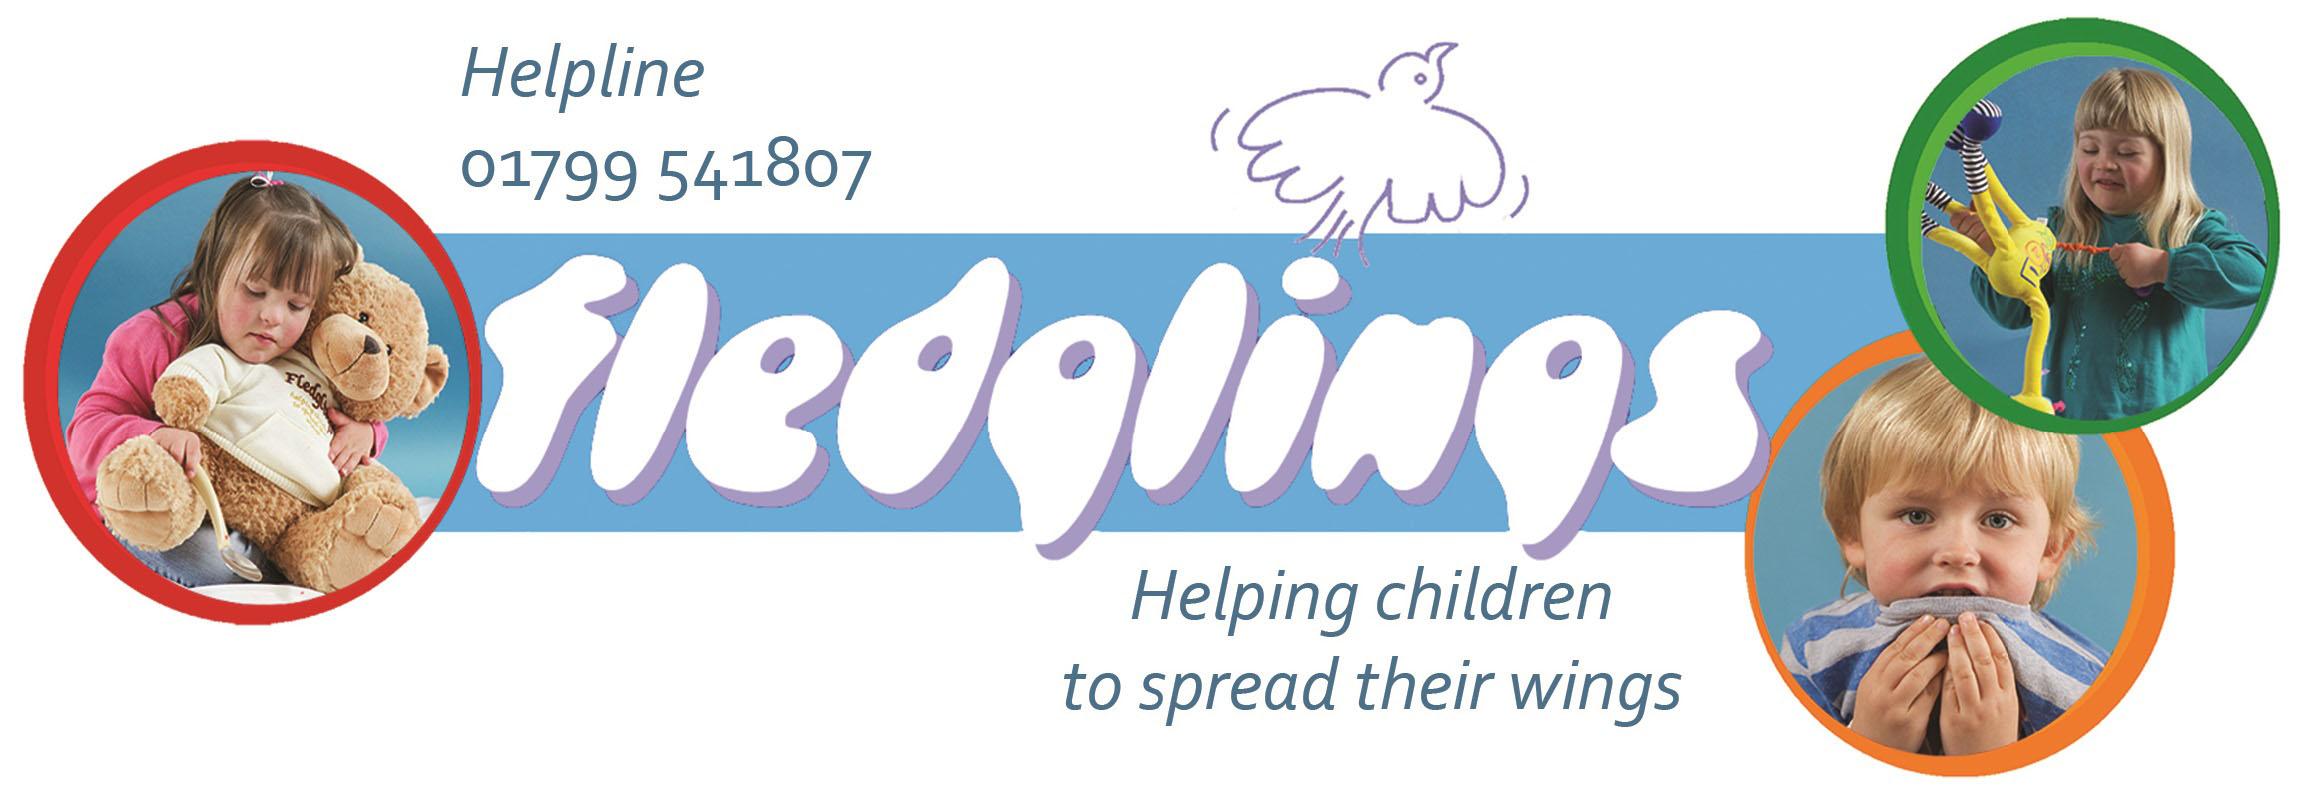 fledglings banner